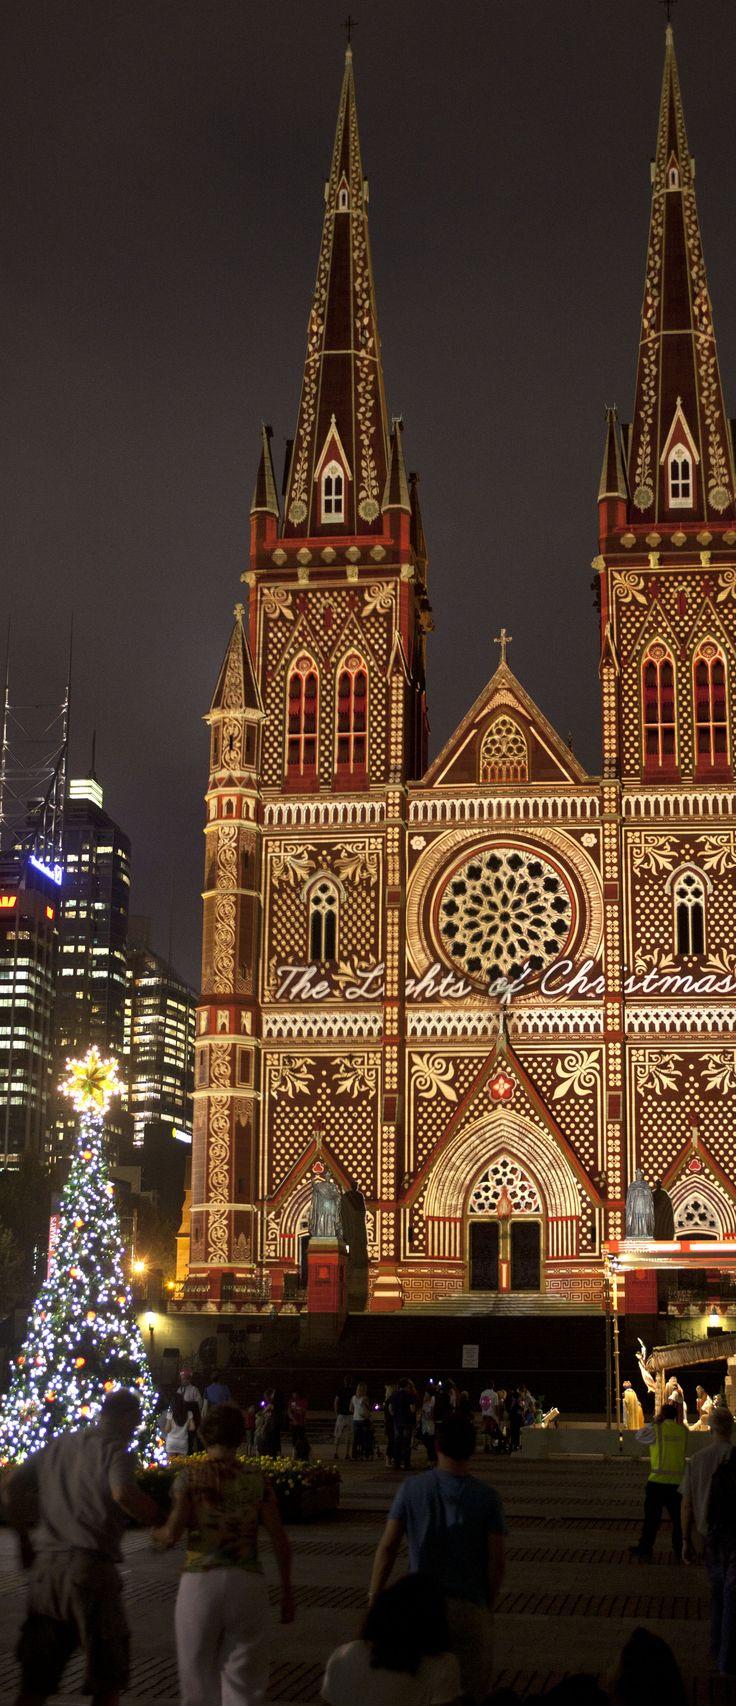 Electric Canvas - Showcase - The Lights of Christmas , Sydney Australia